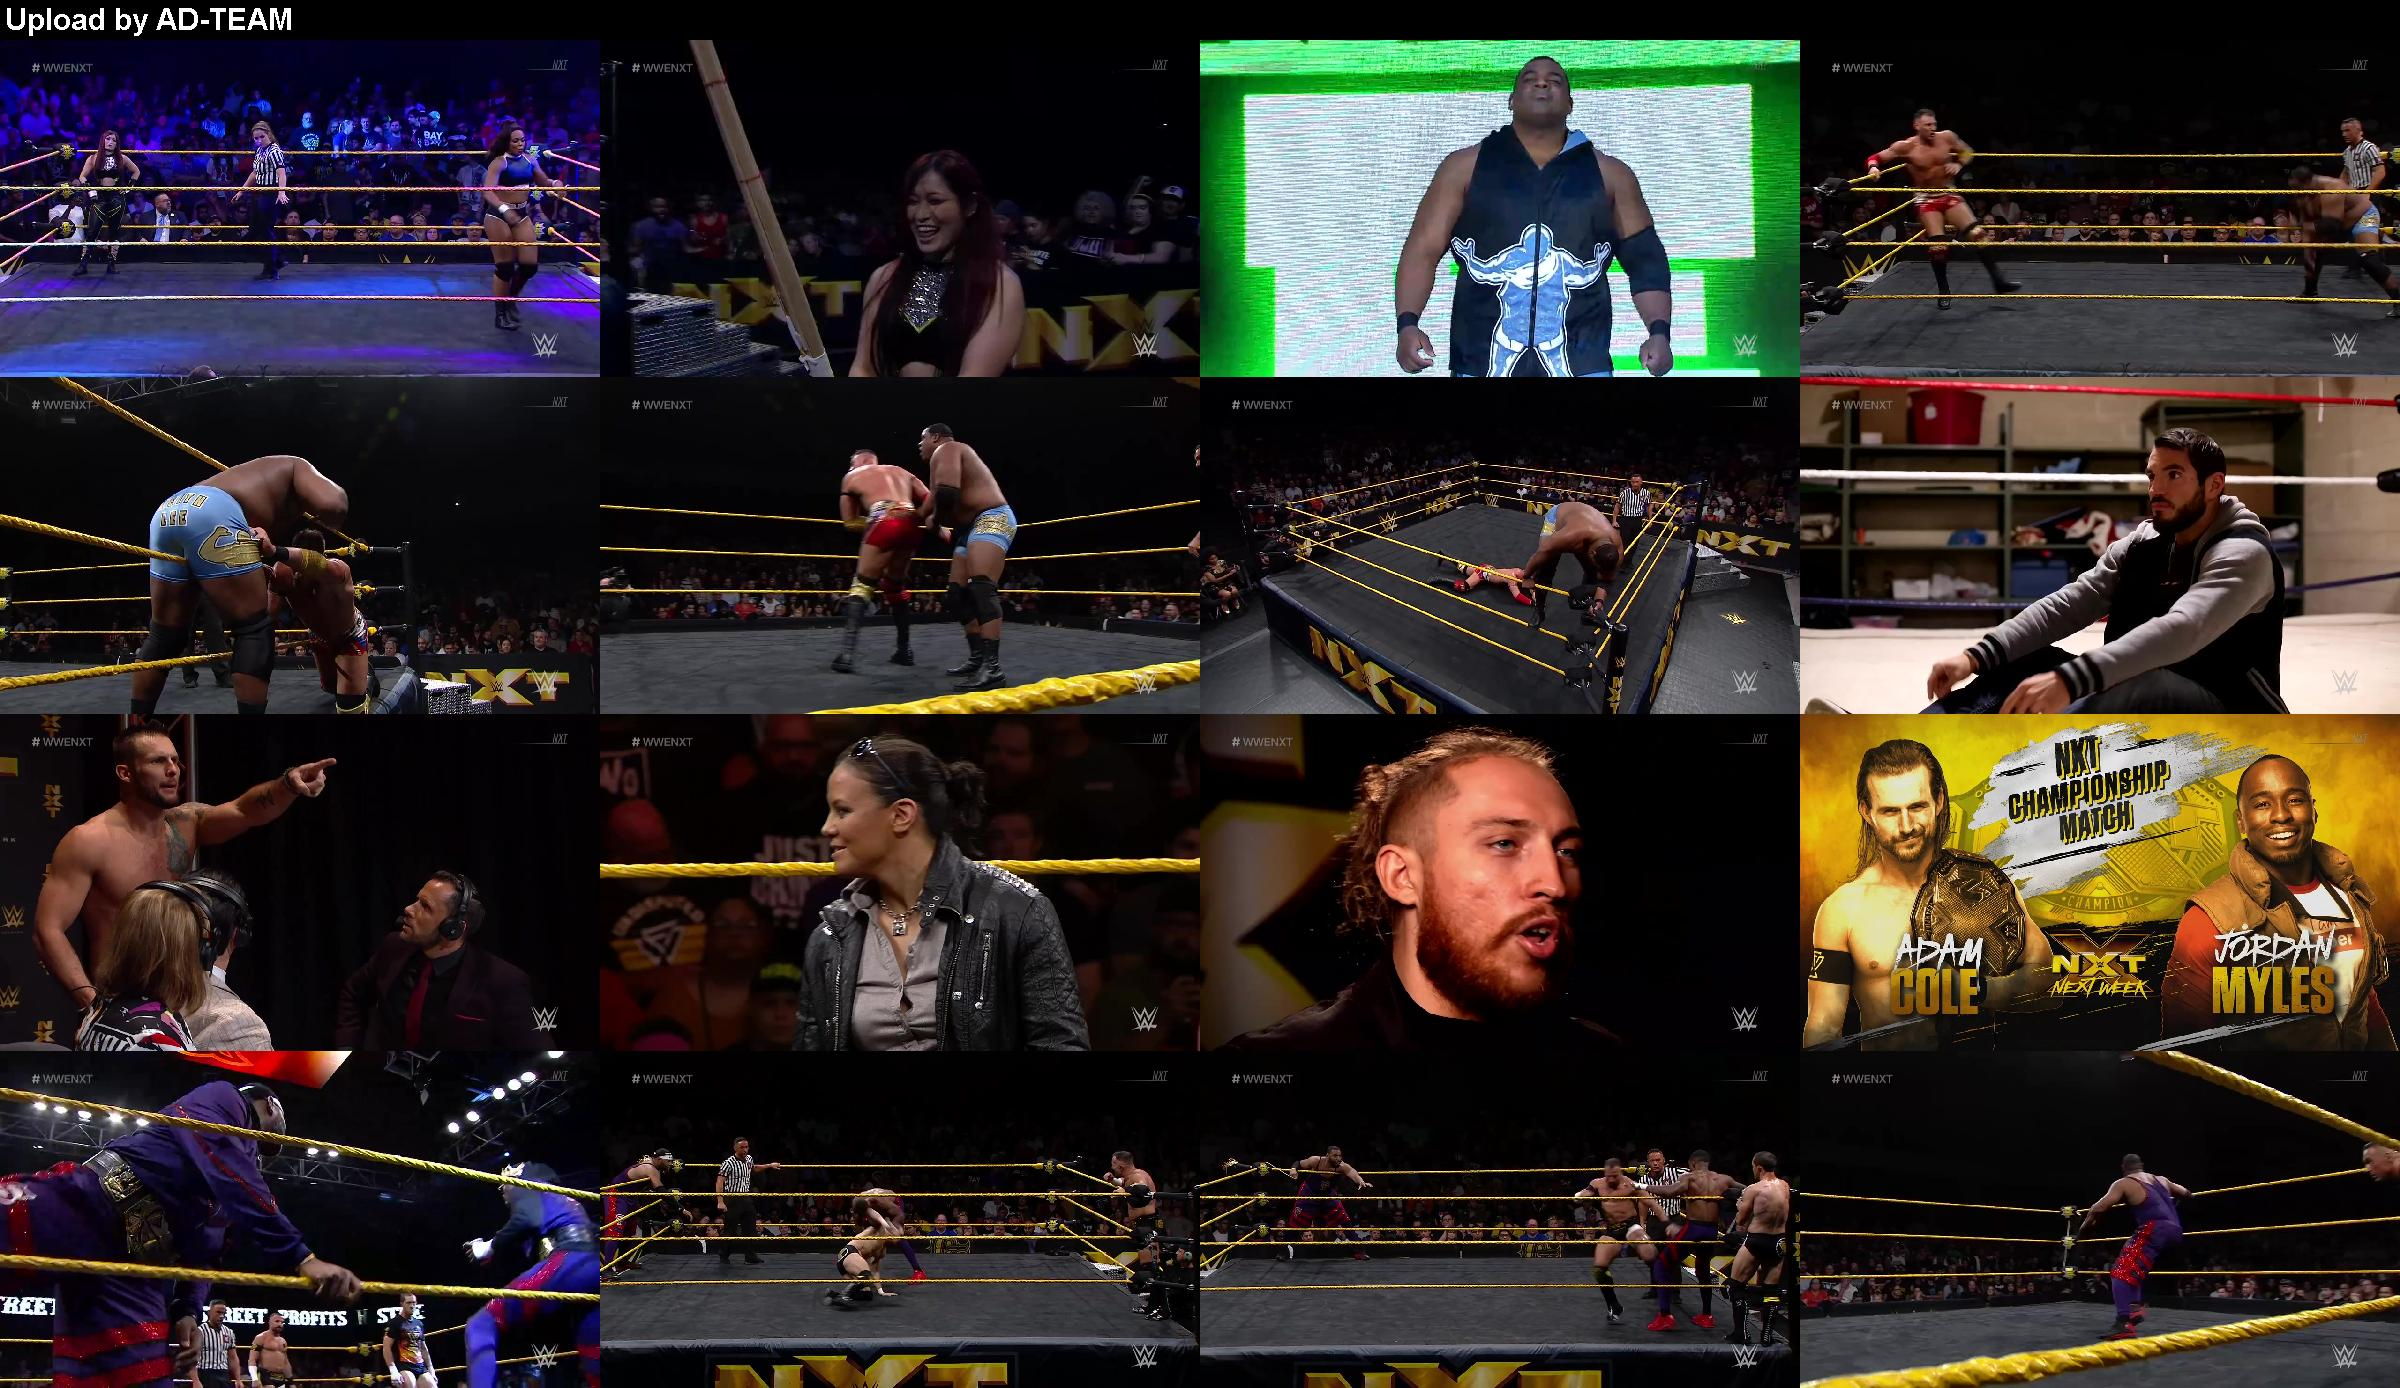 WWE NXT 2019 08 28 720p WEB h264-HEEL